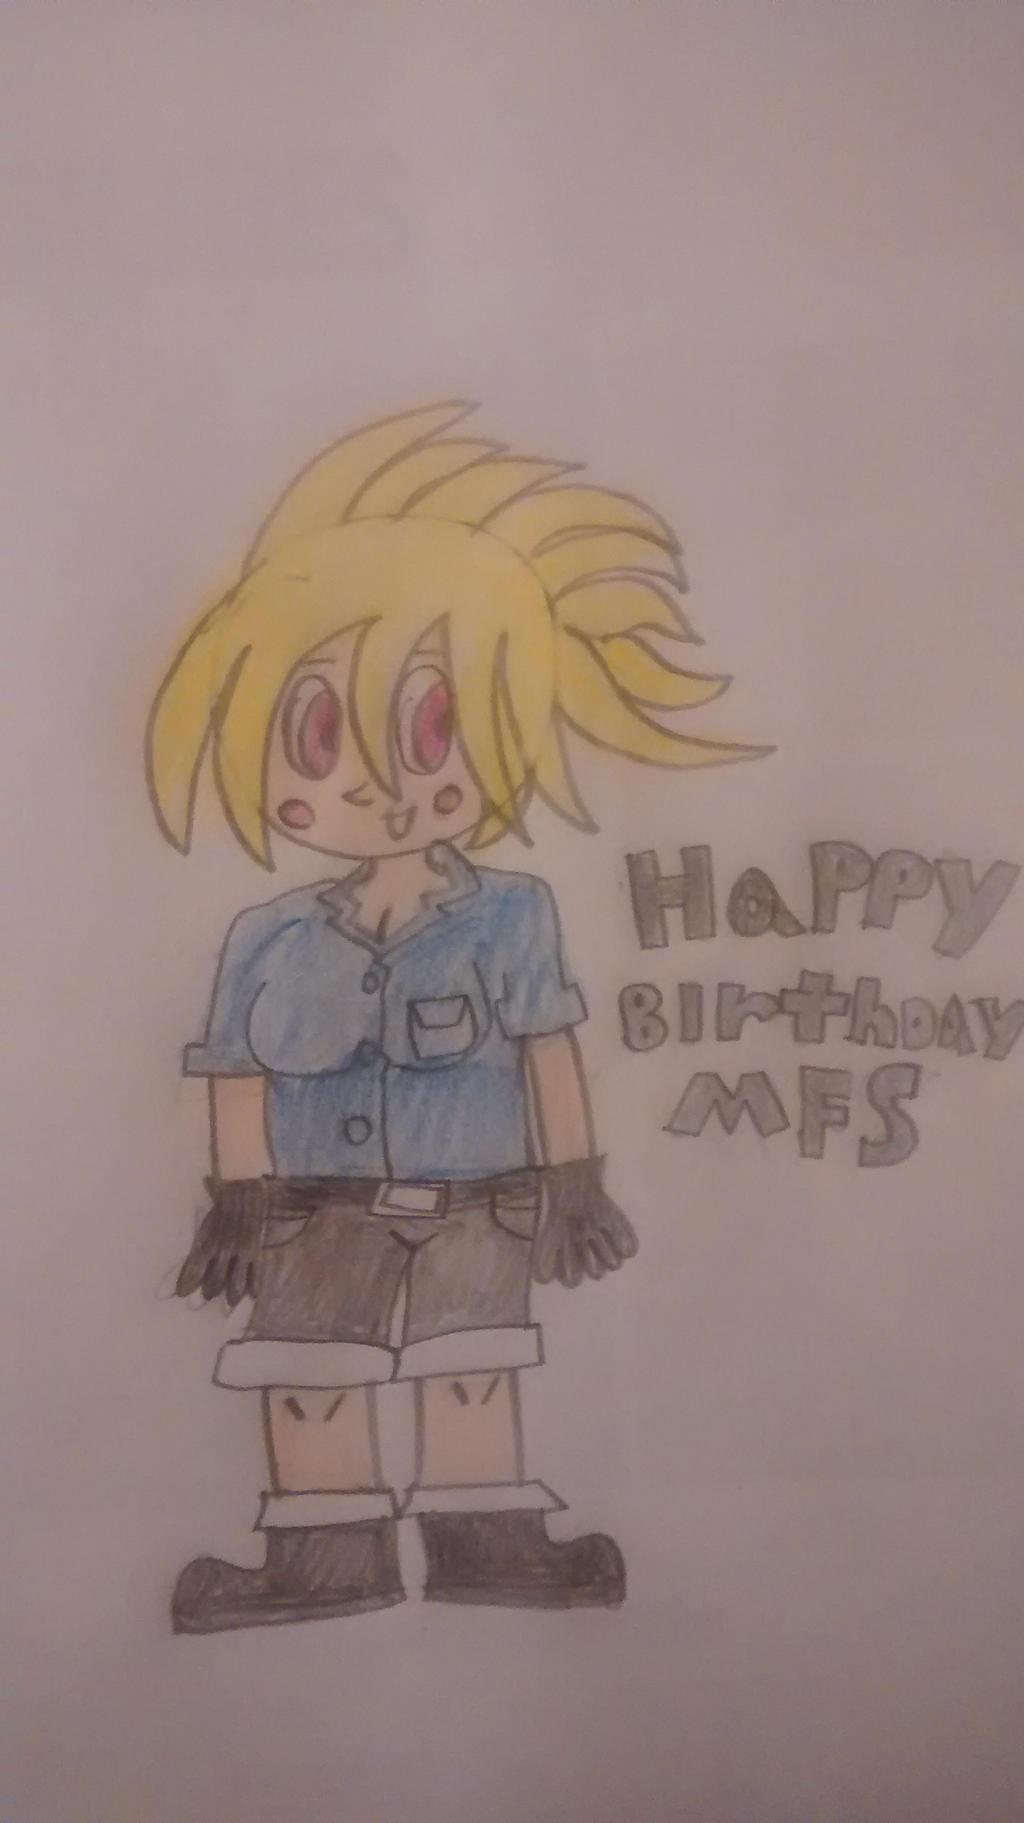 Happy Birthday Mostlyfunstuff by superdes513